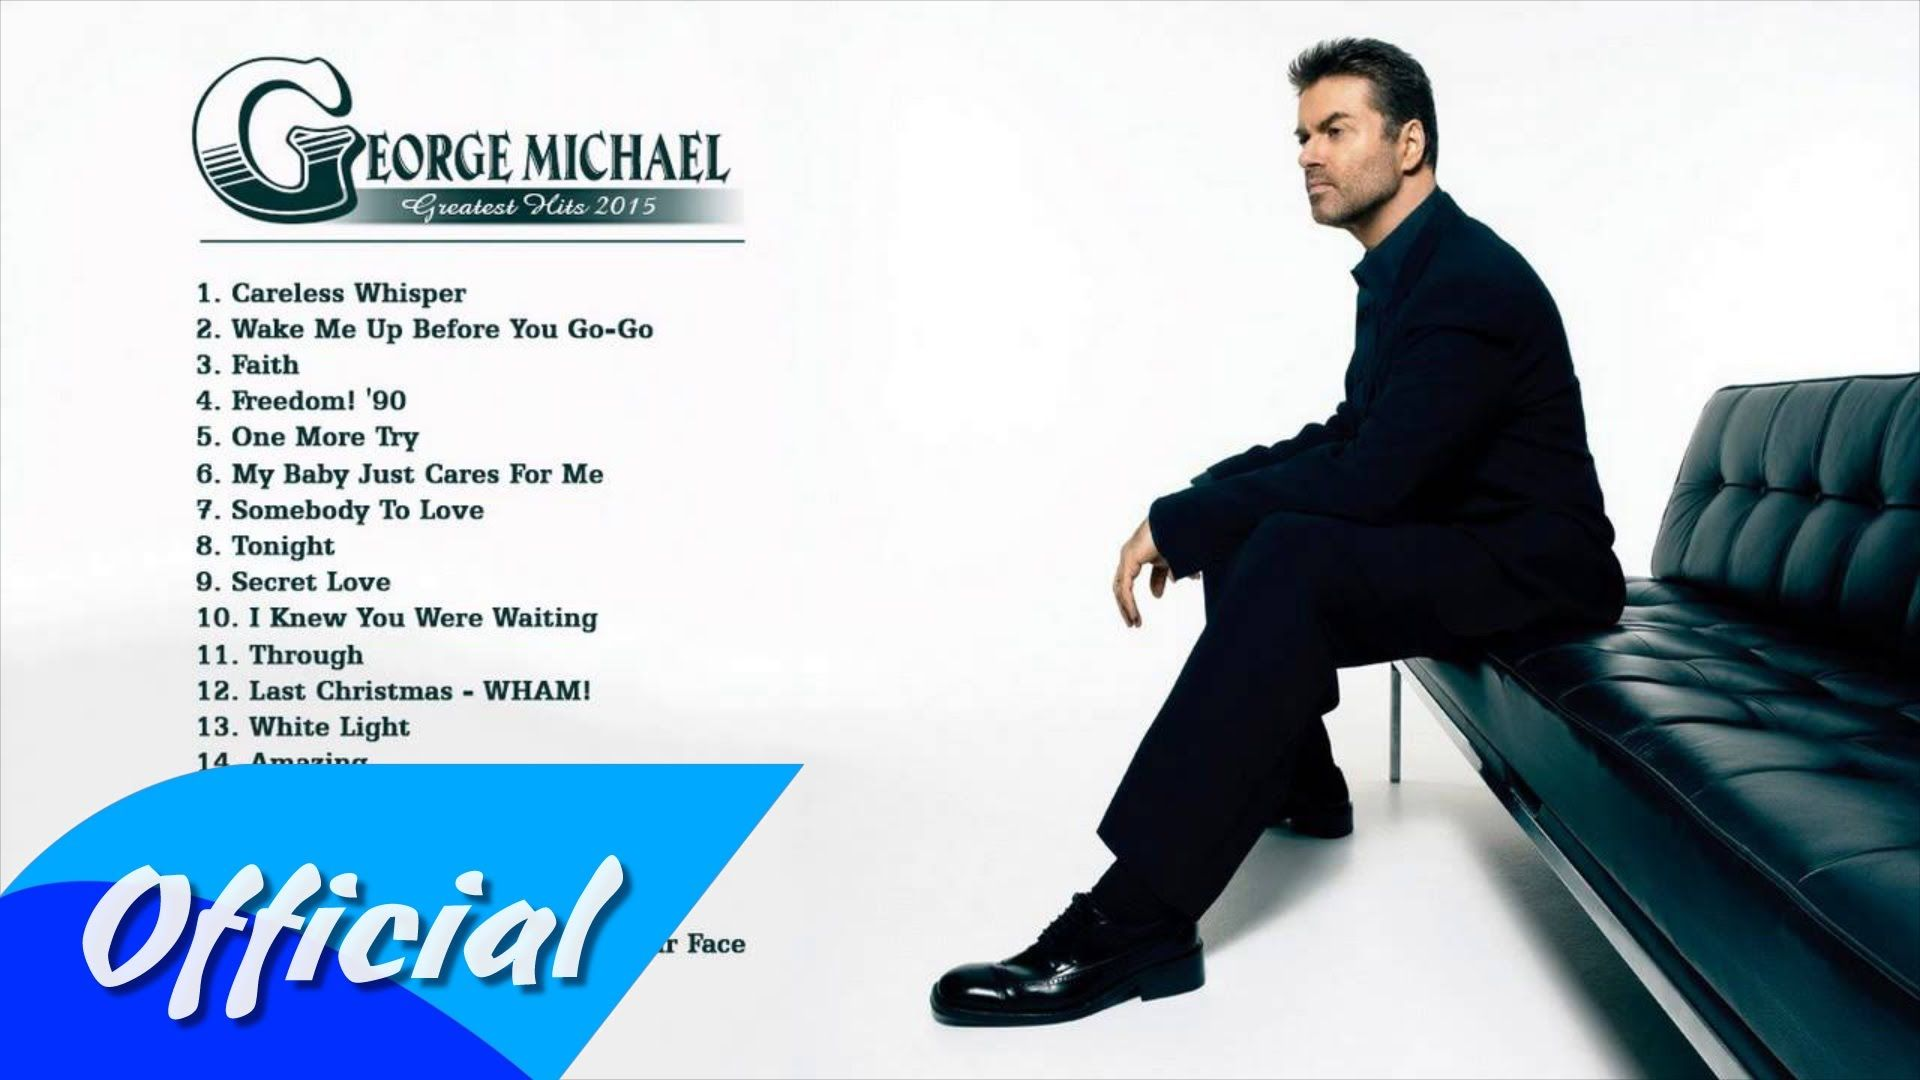 Best of George Michael - George Michael greatest hits album 2015 HD ...